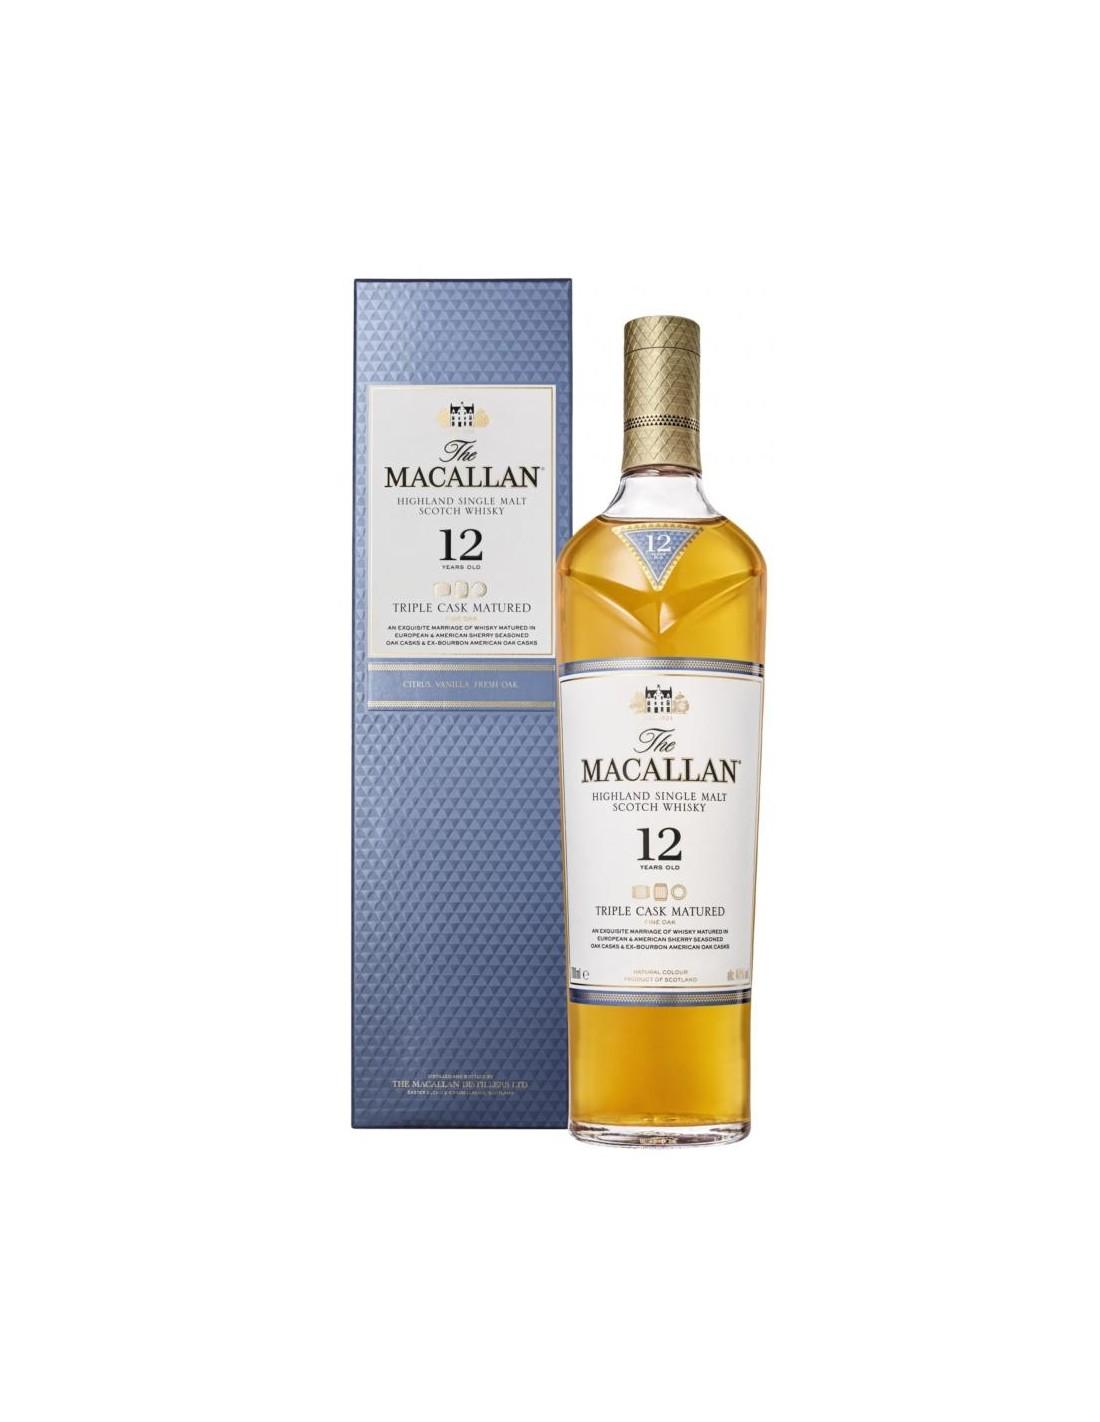 Whisky Single Malt The Macallan Triple Cask, 12 ani, 40% alc., 0.7L, Scotia